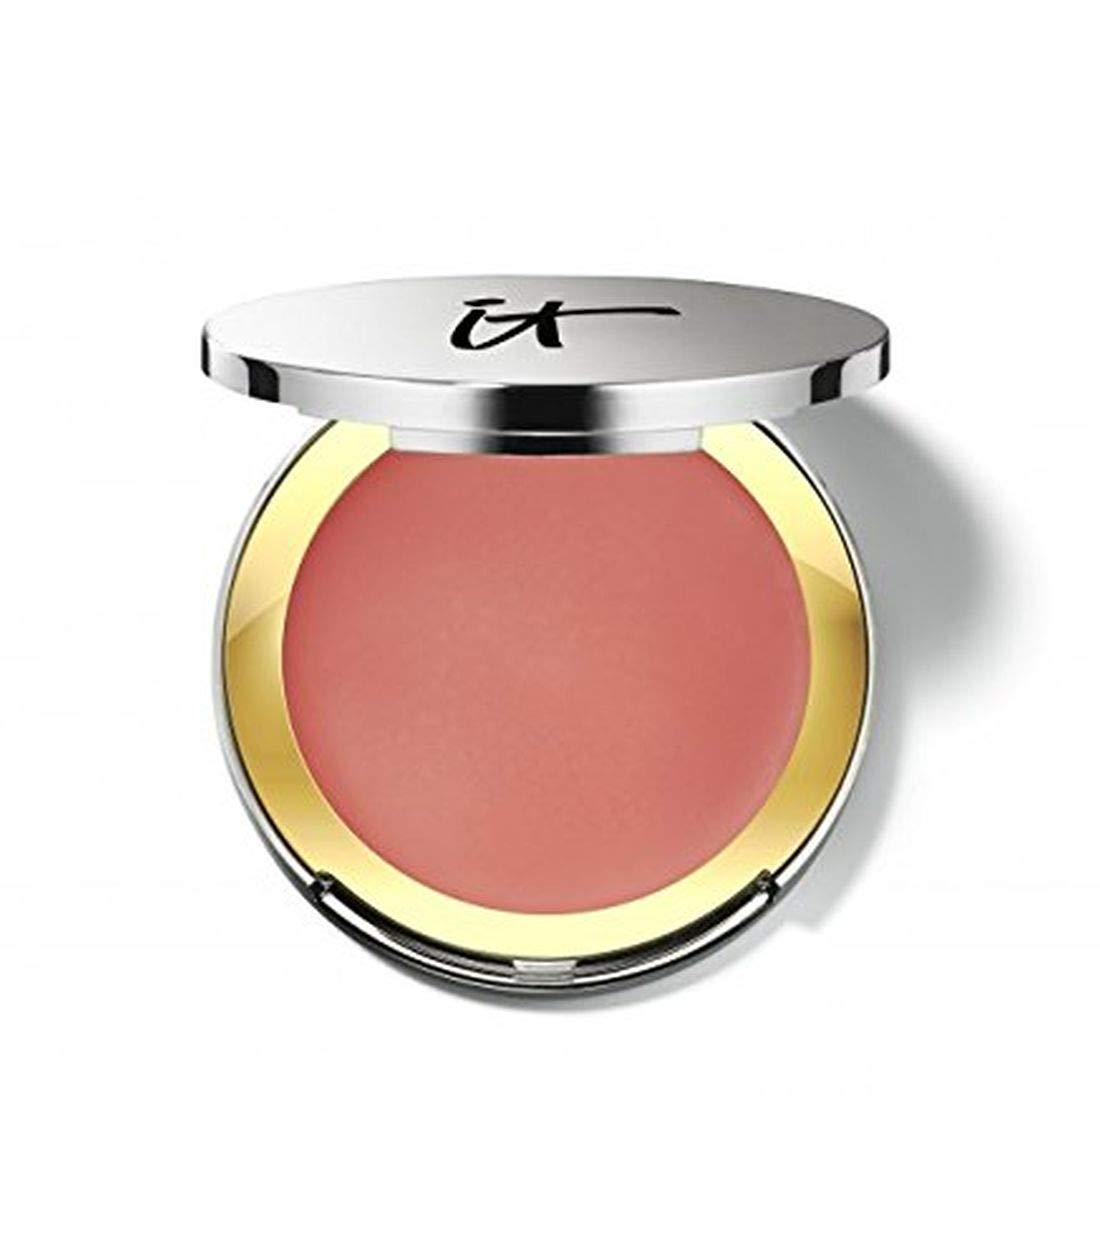 IT Cosmetics CC+Vitality Brightening Creme Blush: Naturally Pretty NEW!!